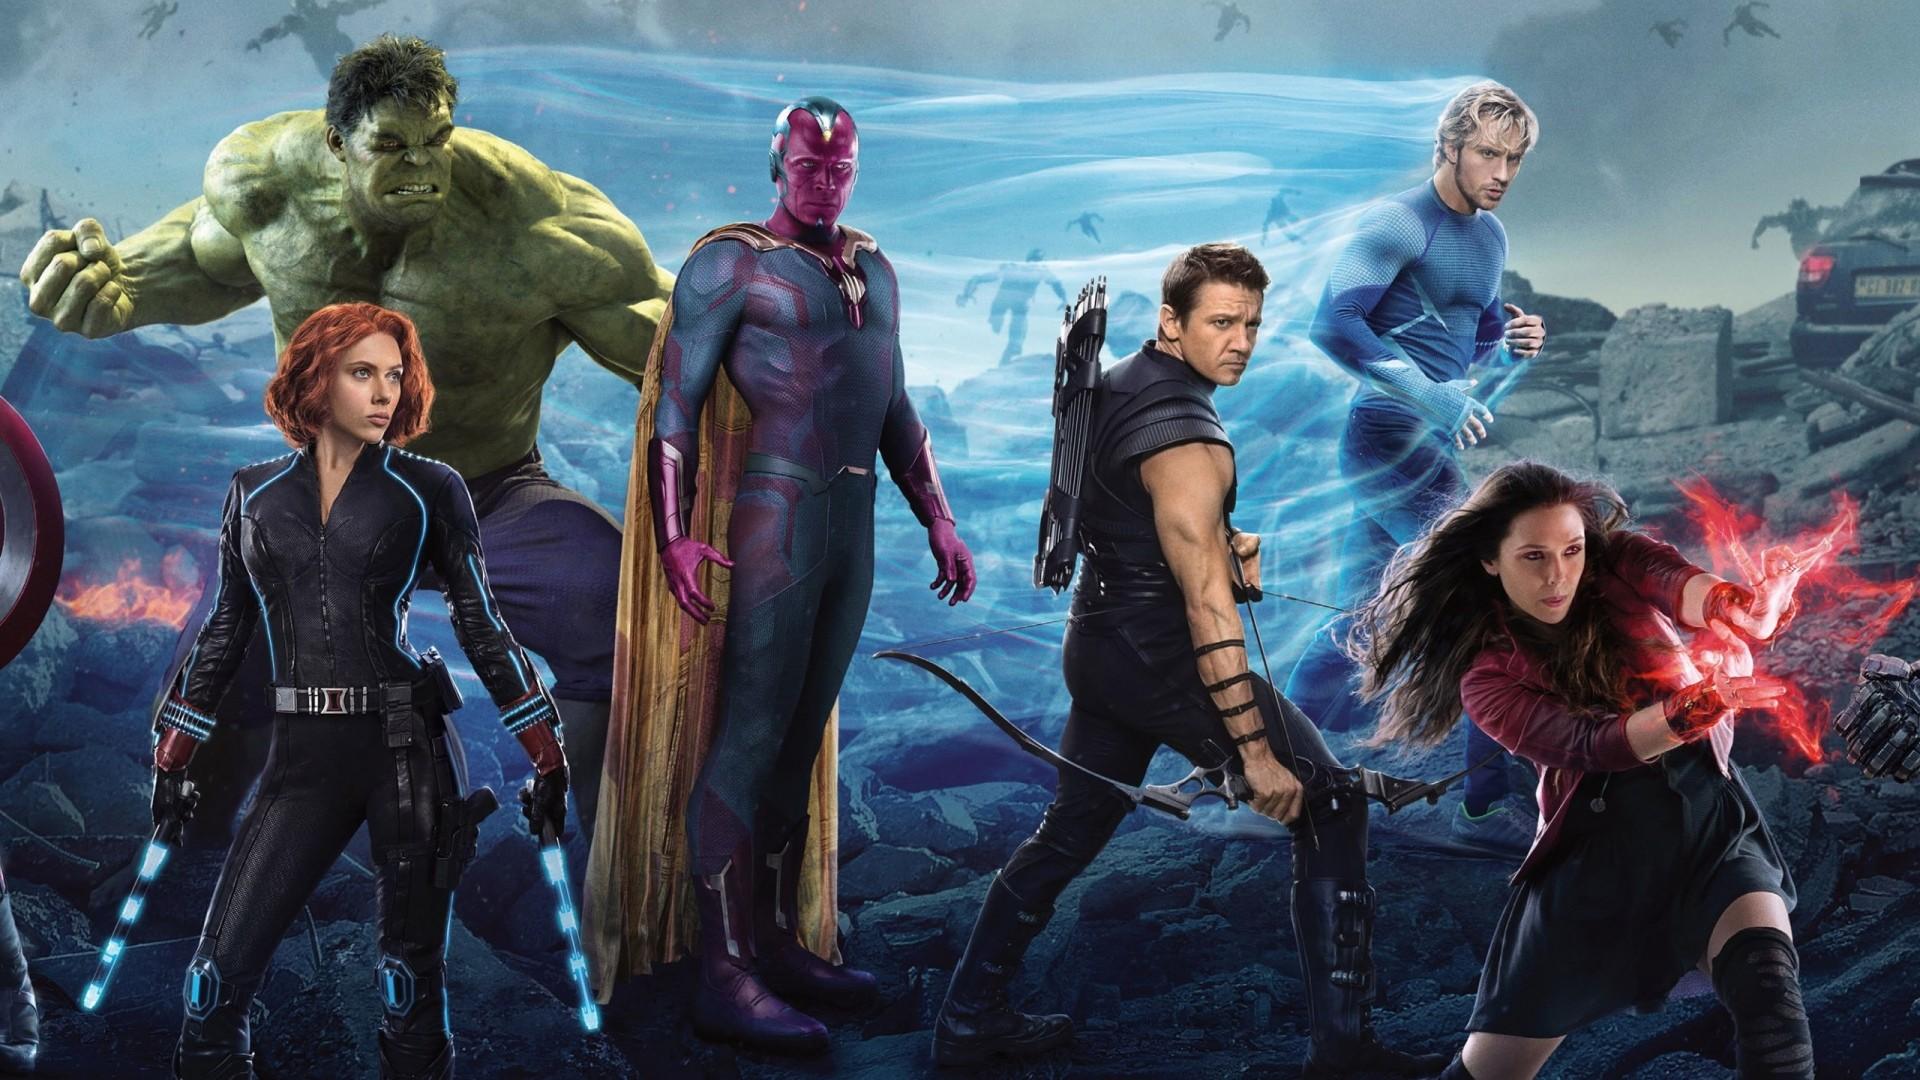 … Background Full HD 1080p. Wallpaper avengers, avengers age of  ultron, thor, captain america, black widow